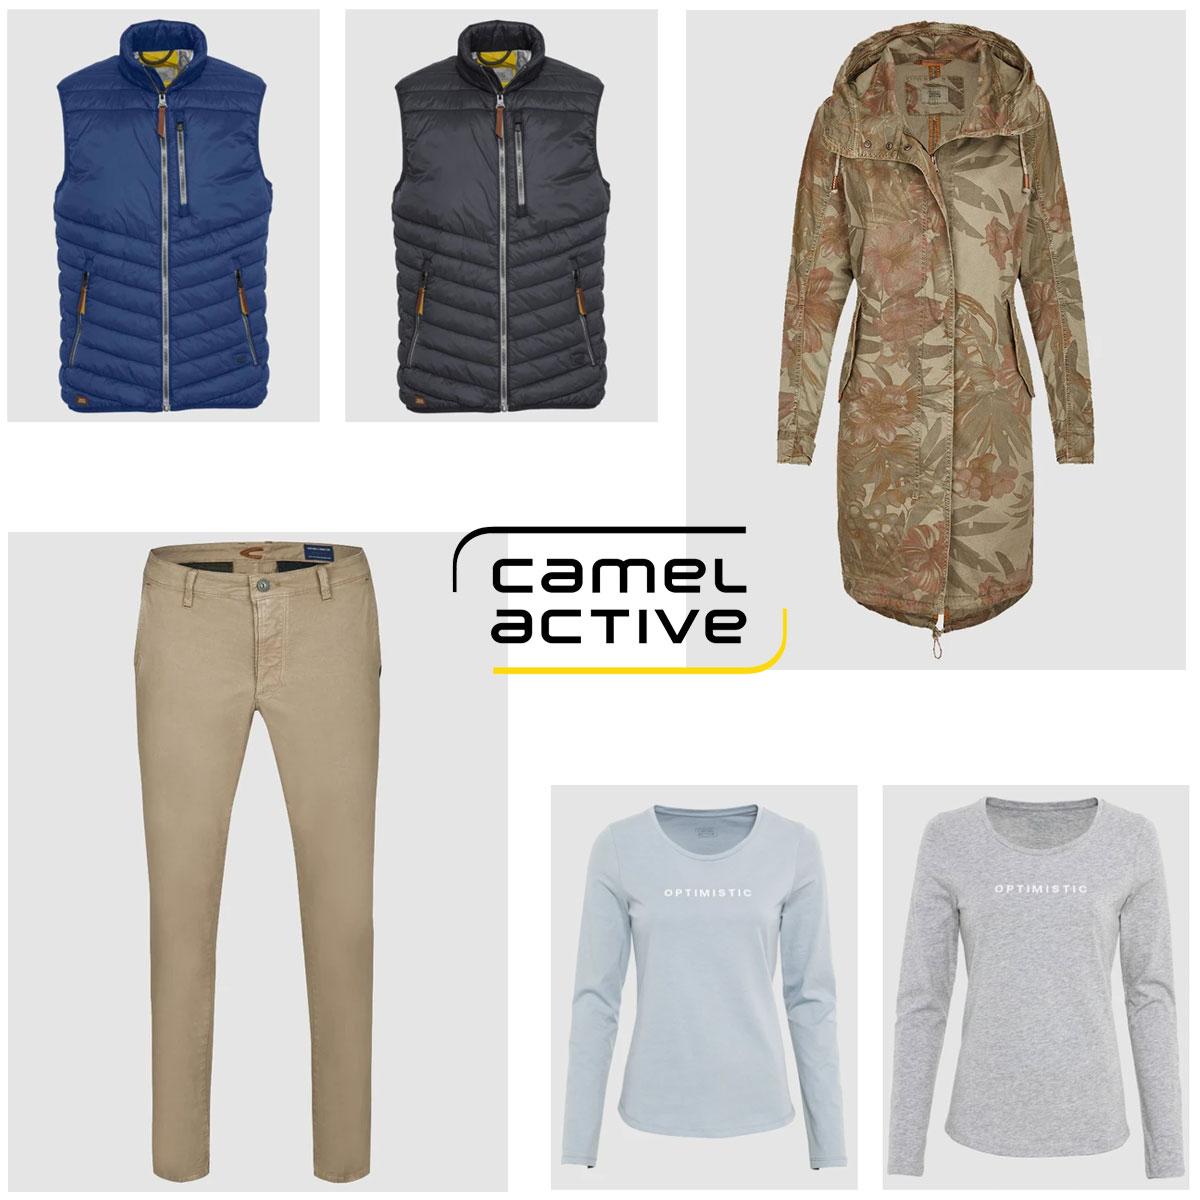 Camel Active dames & herenkleding 50-70% korting